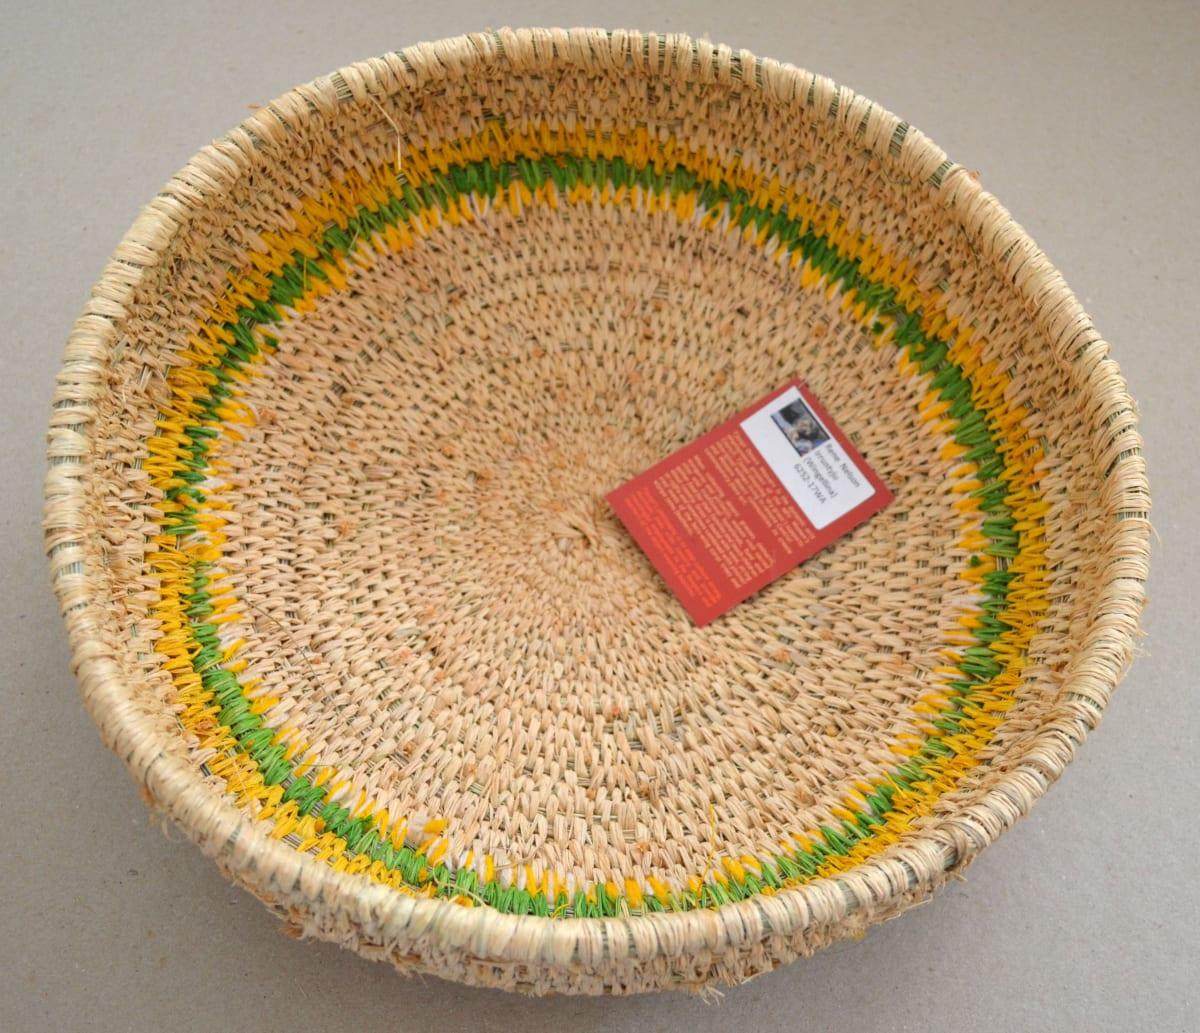 Rene Nelson Basket minarri grass and raffia 8 x 32 cm